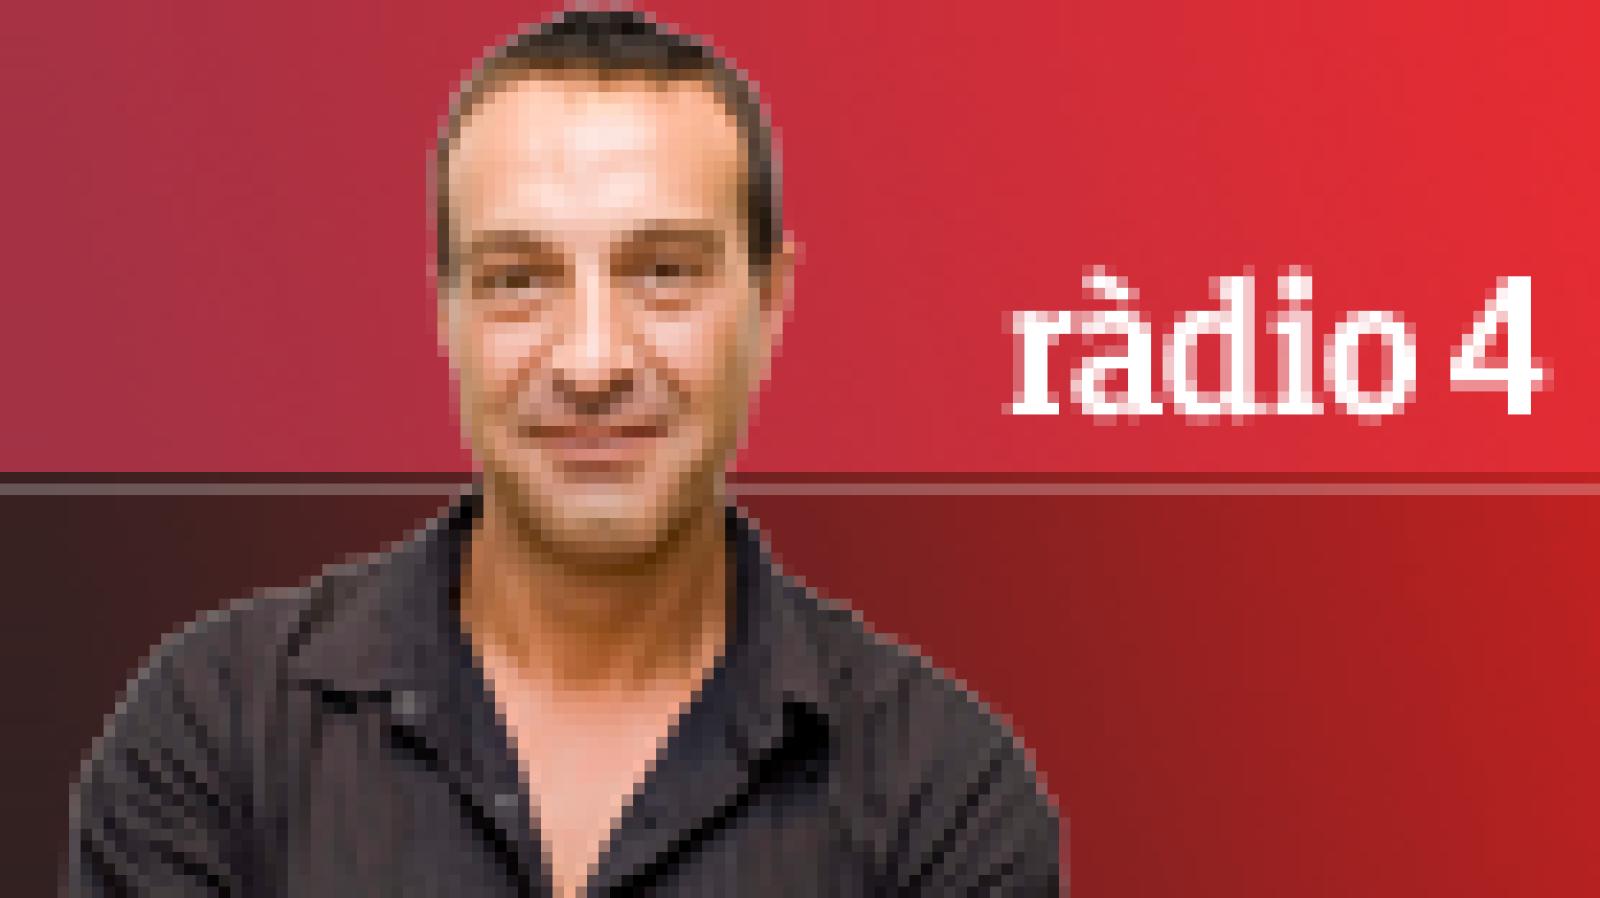 Matí a 4 Bandes - Entrevista a Leopoldo Abadía.  Tertúlia de joves, amb Dani Garcia, Adrián Pino, Mireia Huerta, Bernat Mallén i Benjamín Villegas